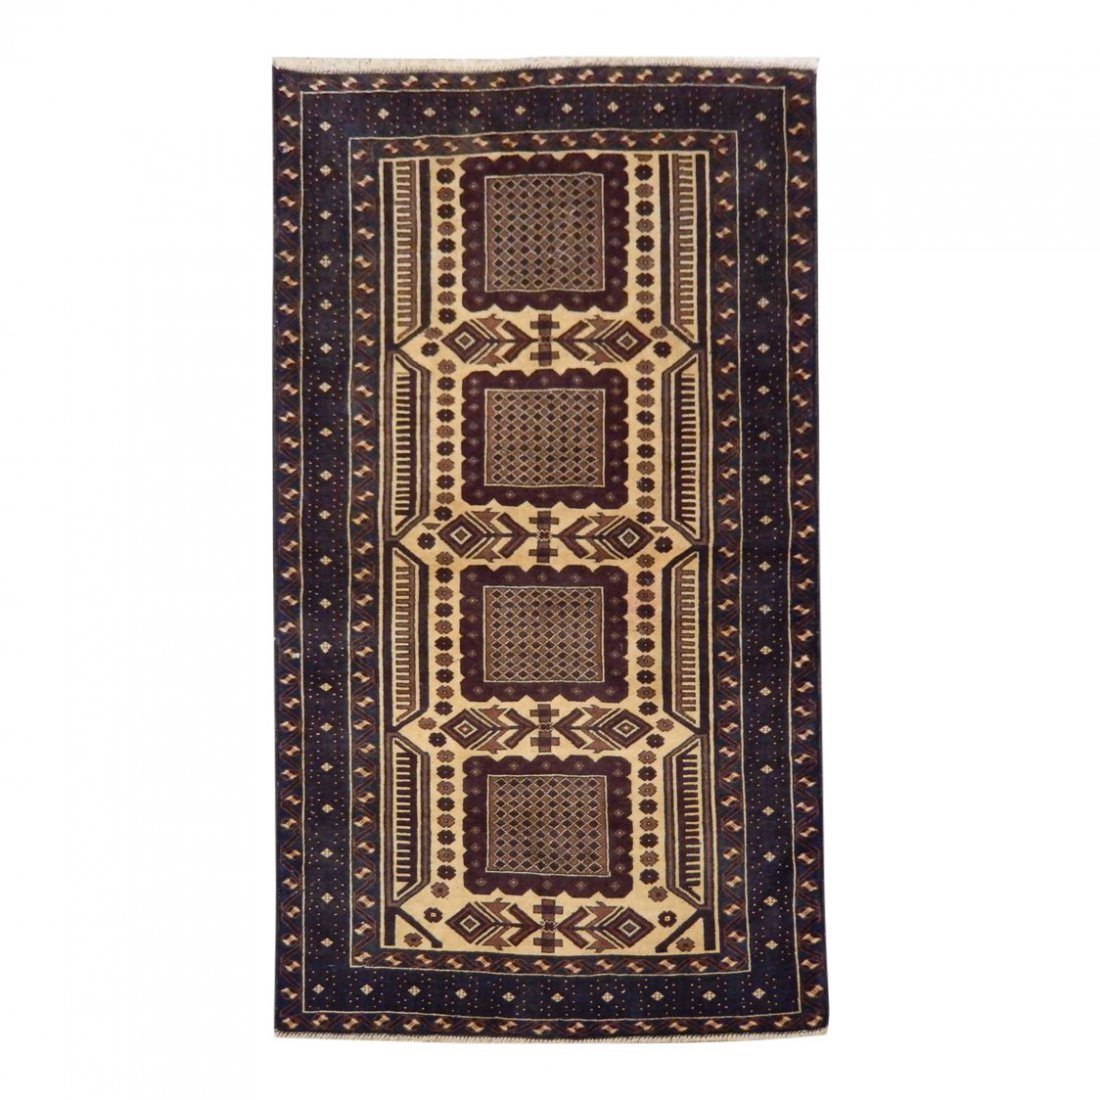 Persian Baluch Heart Tribal Rug 3.7x6.4